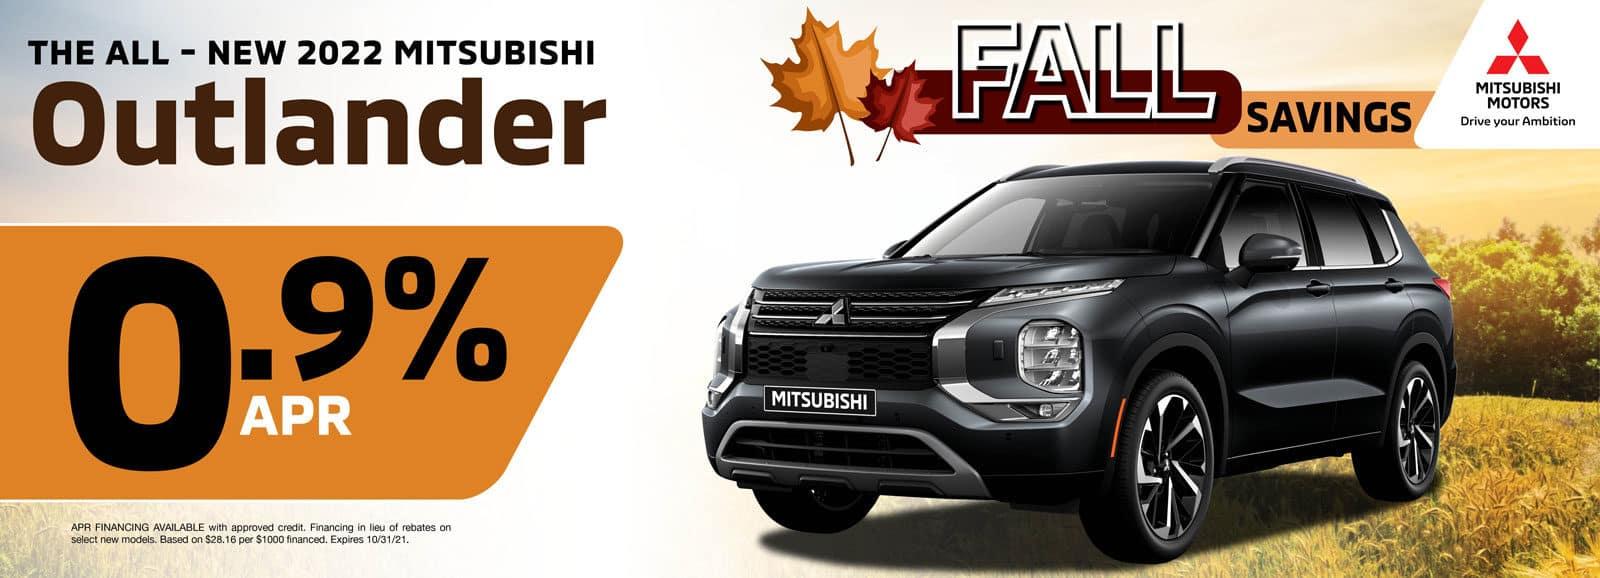 2022 Mitsubishi Outlander for 0.9% APR